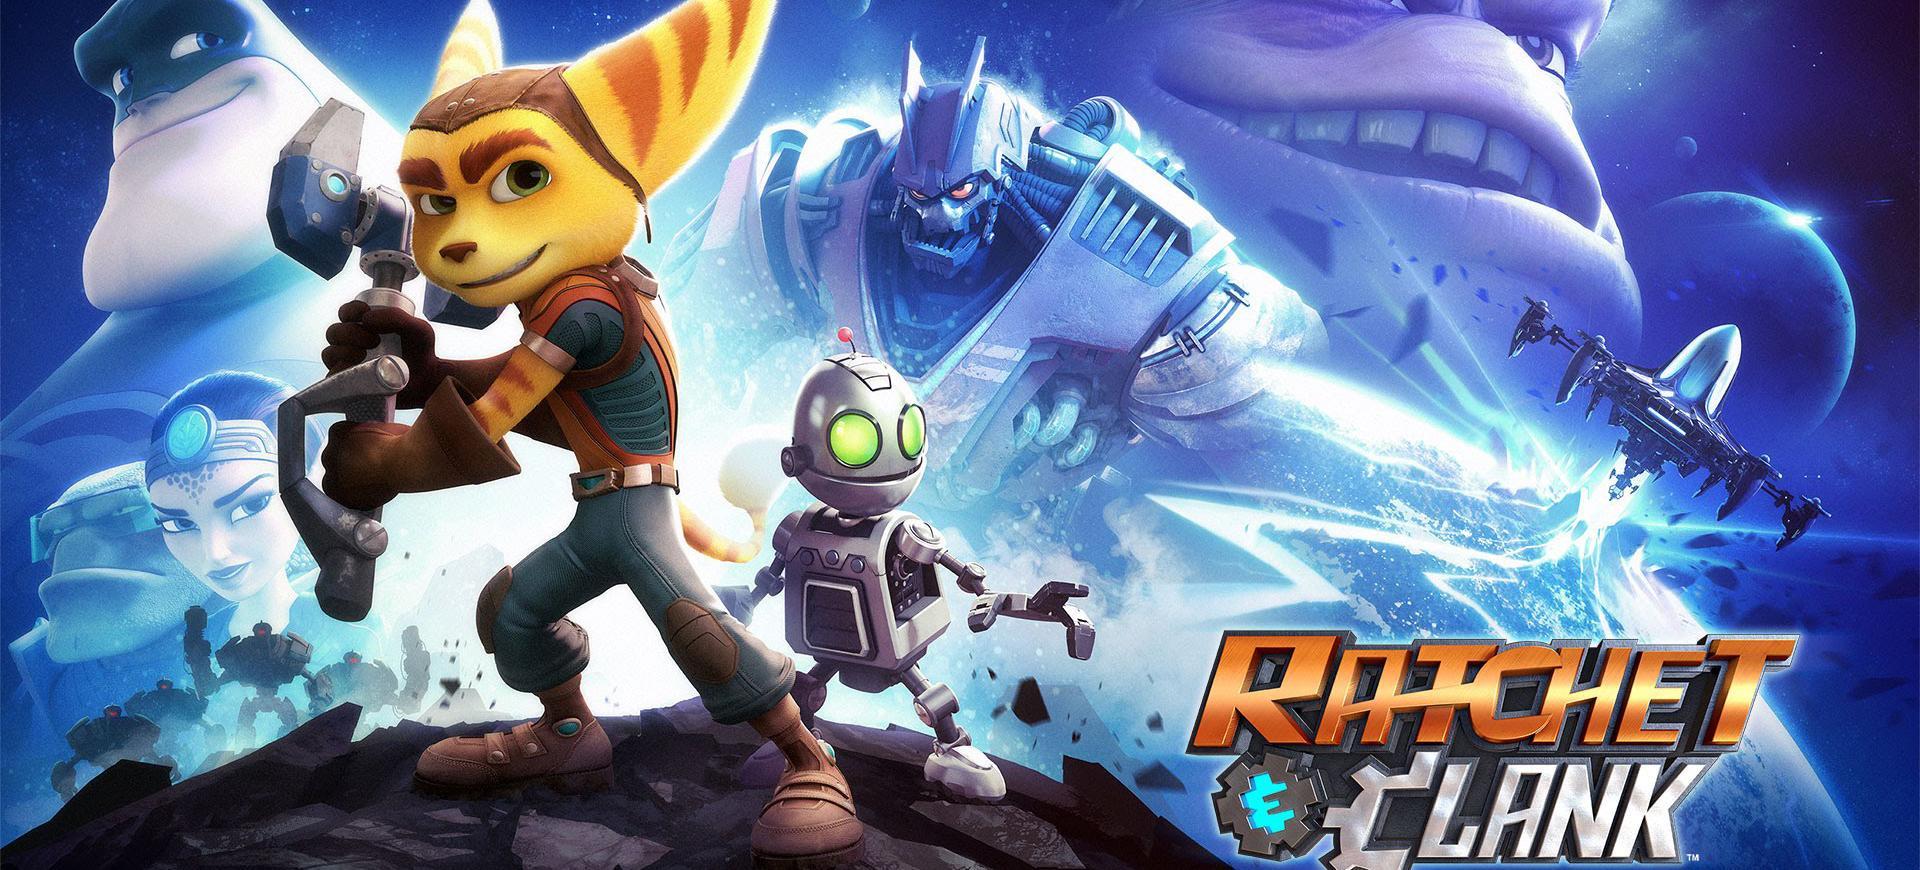 Ratchet and Clank (PS4) - Đánh Giá Game